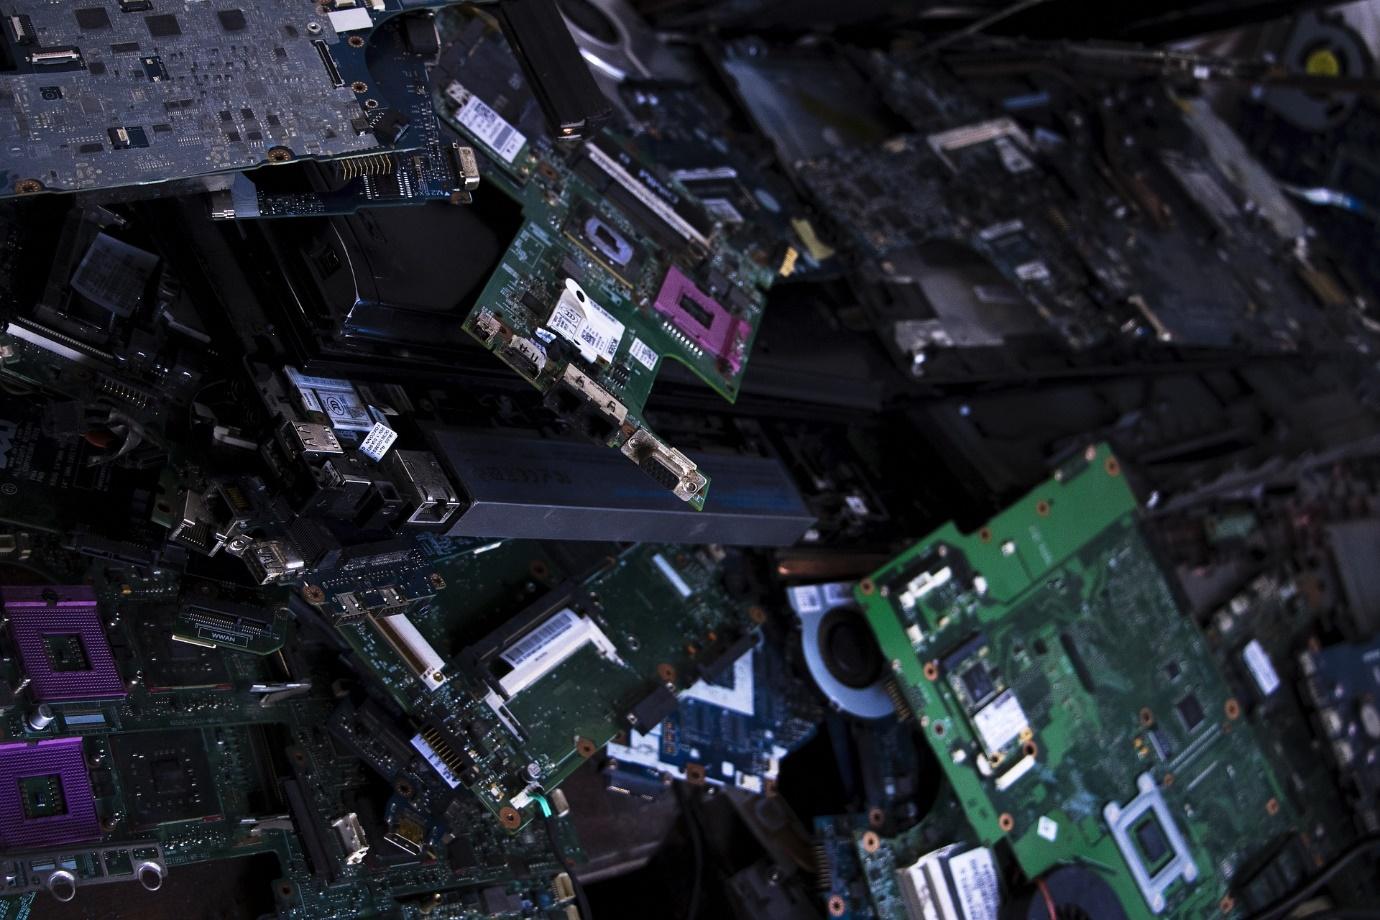 Computer's Full of Junk